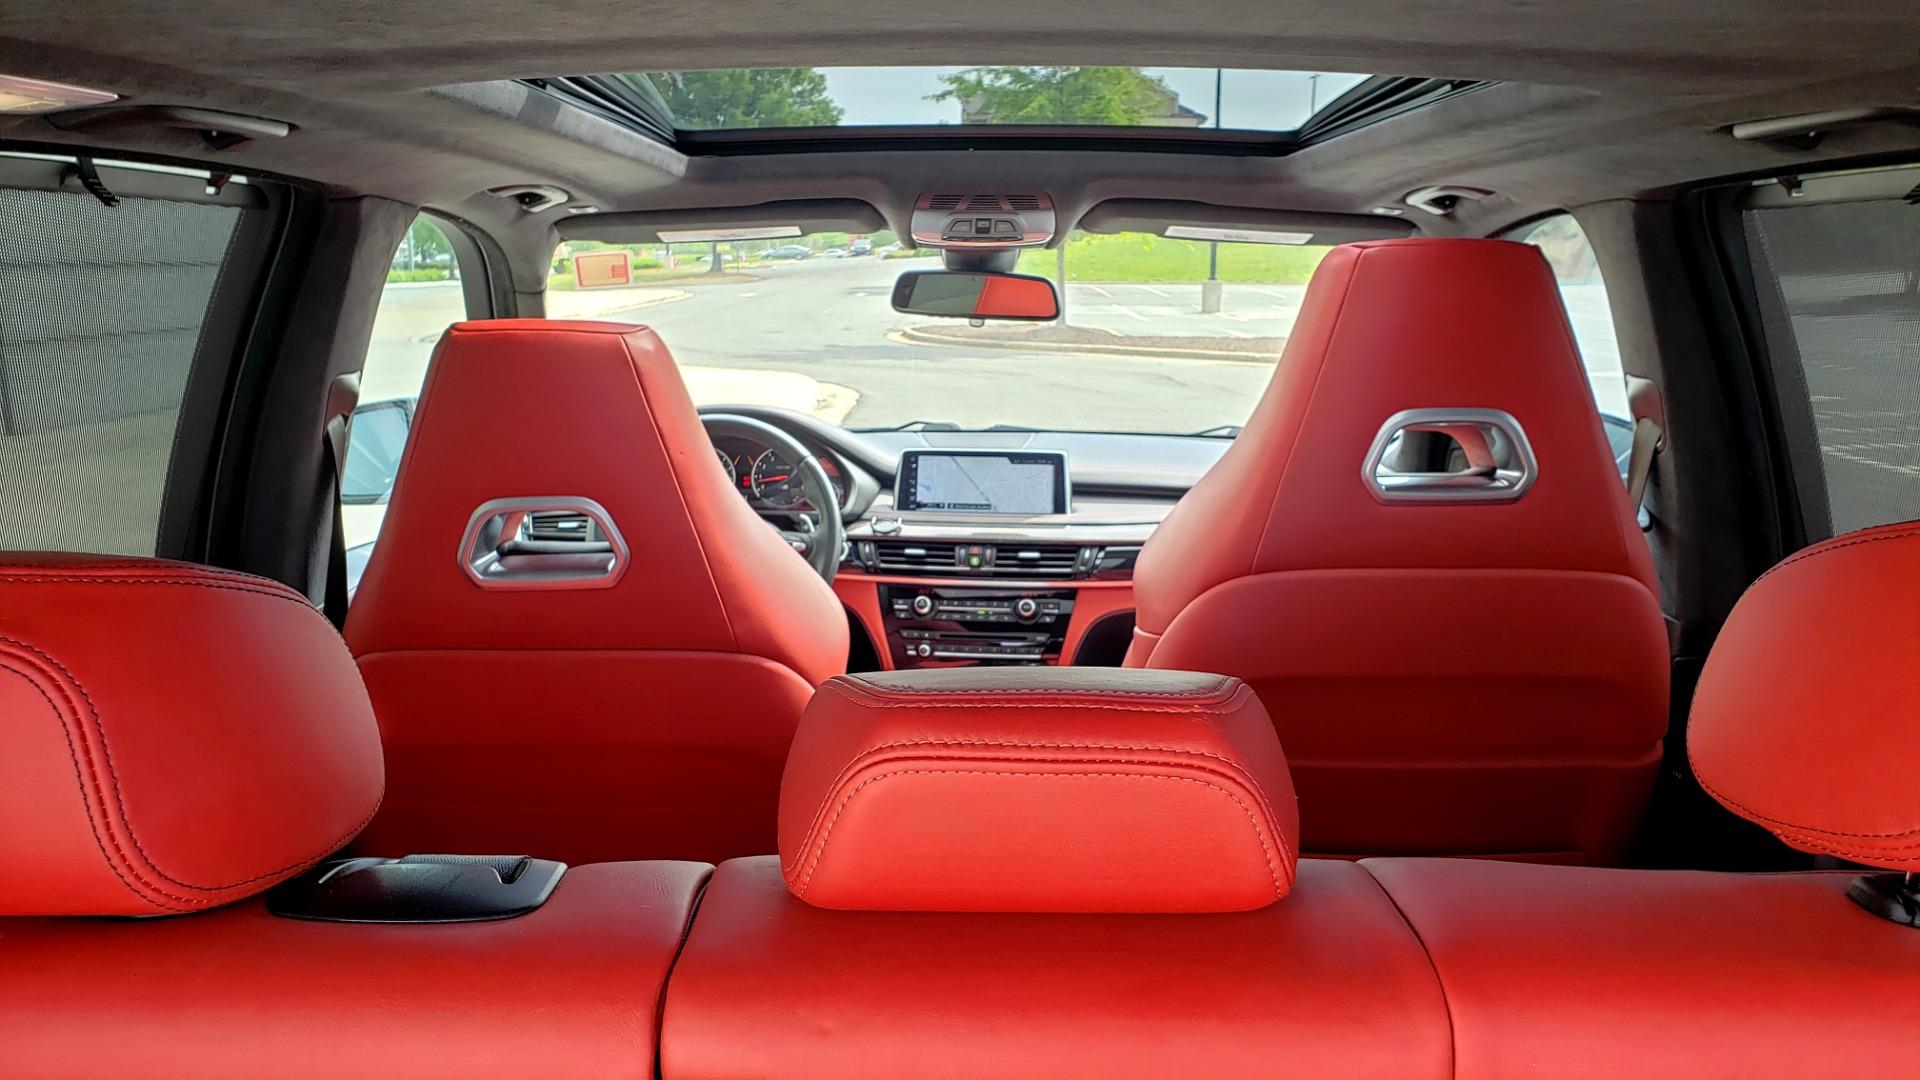 Used 2017 BMW X5 M EXECUTIVE PKG / NAV / DRVR ASST / BSM / HUD / HTD STS / WIFI for sale Sold at Formula Imports in Charlotte NC 28227 20